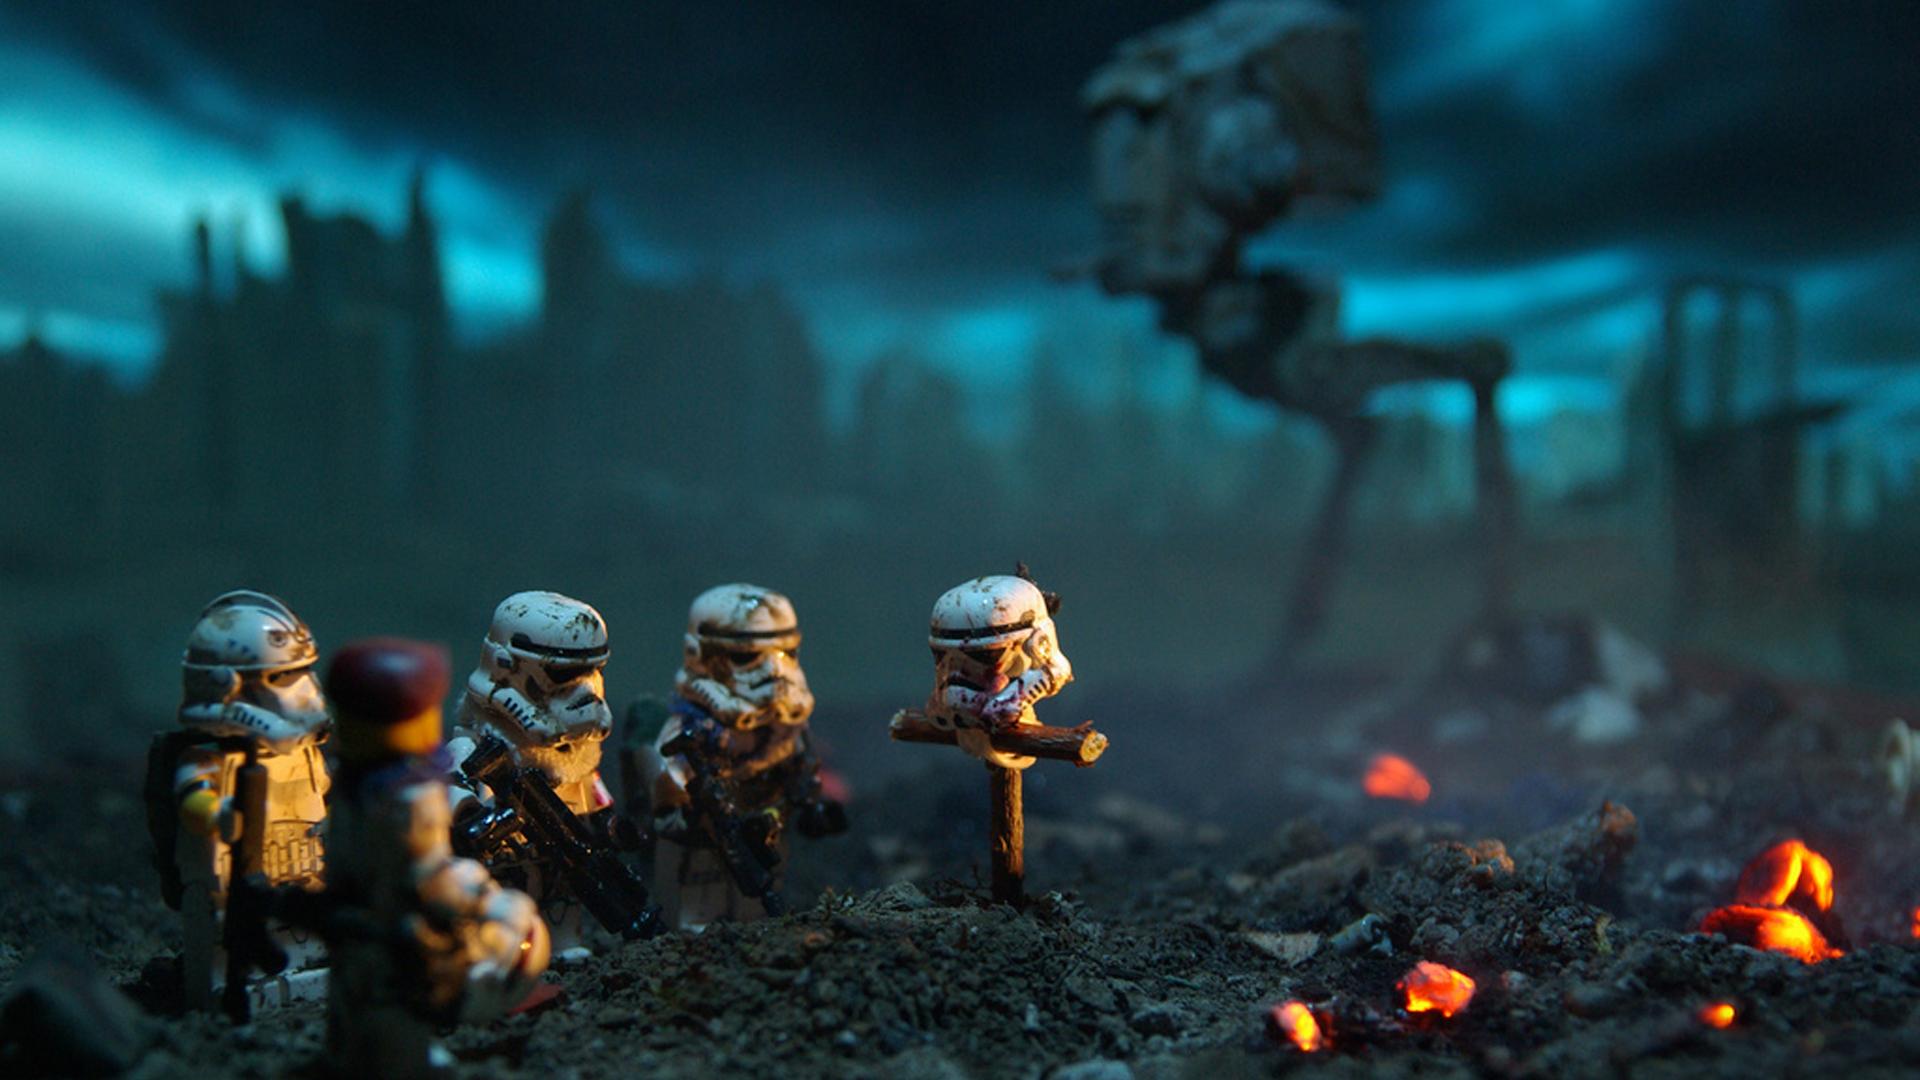 General 1920x1080 miniatures depth of field Battlefield stormtrooper toys dark AT-ST humor blue AT-ST Walker